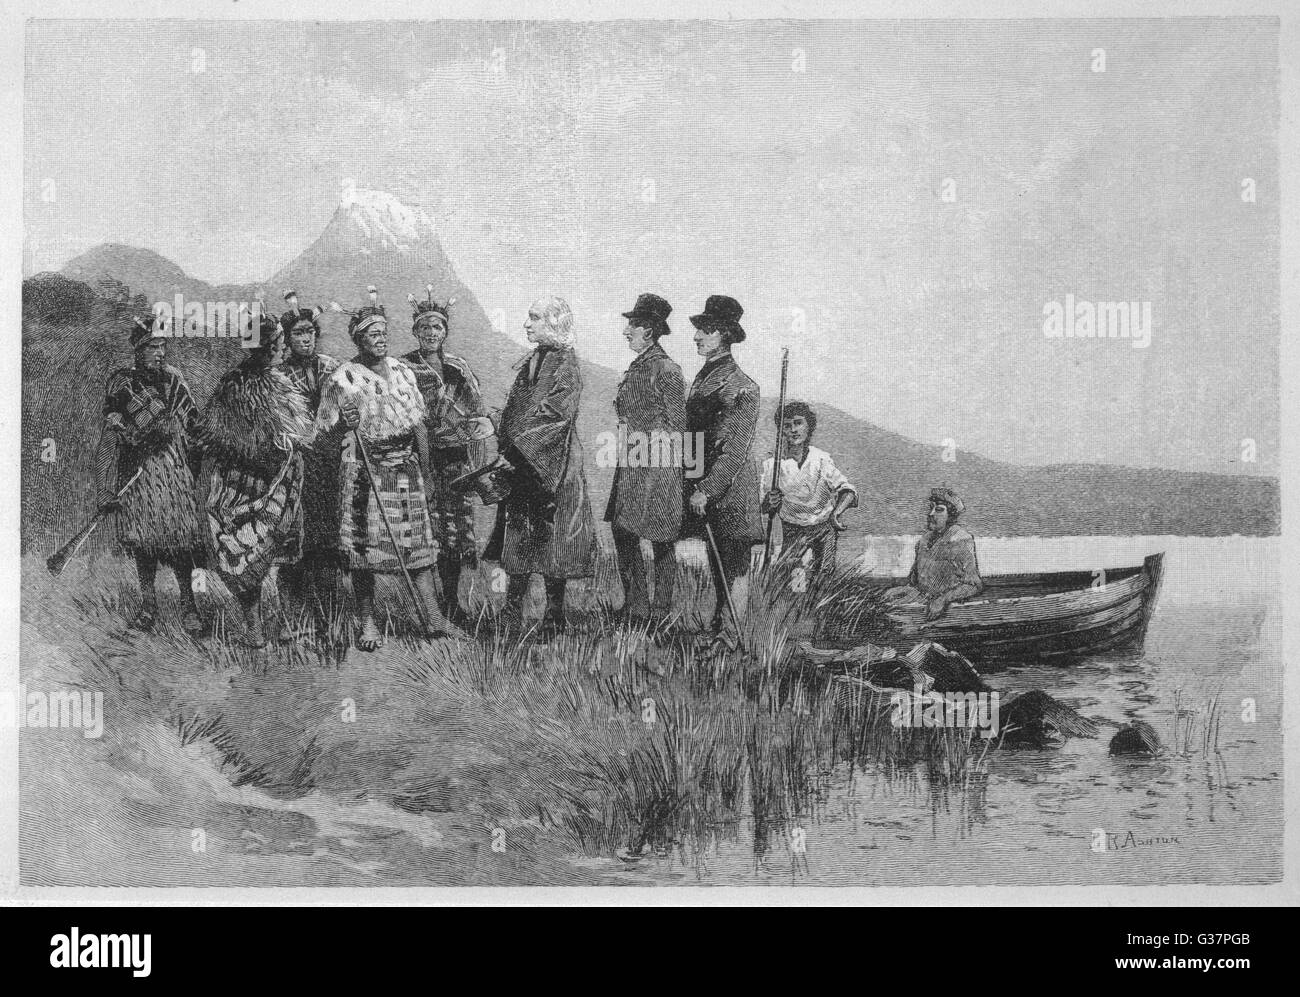 SAMUEL MARSDEN lands in the  Bay of Islands(North Island)   and is met by native Maoris.        Date: circa 1809 - Stock Image